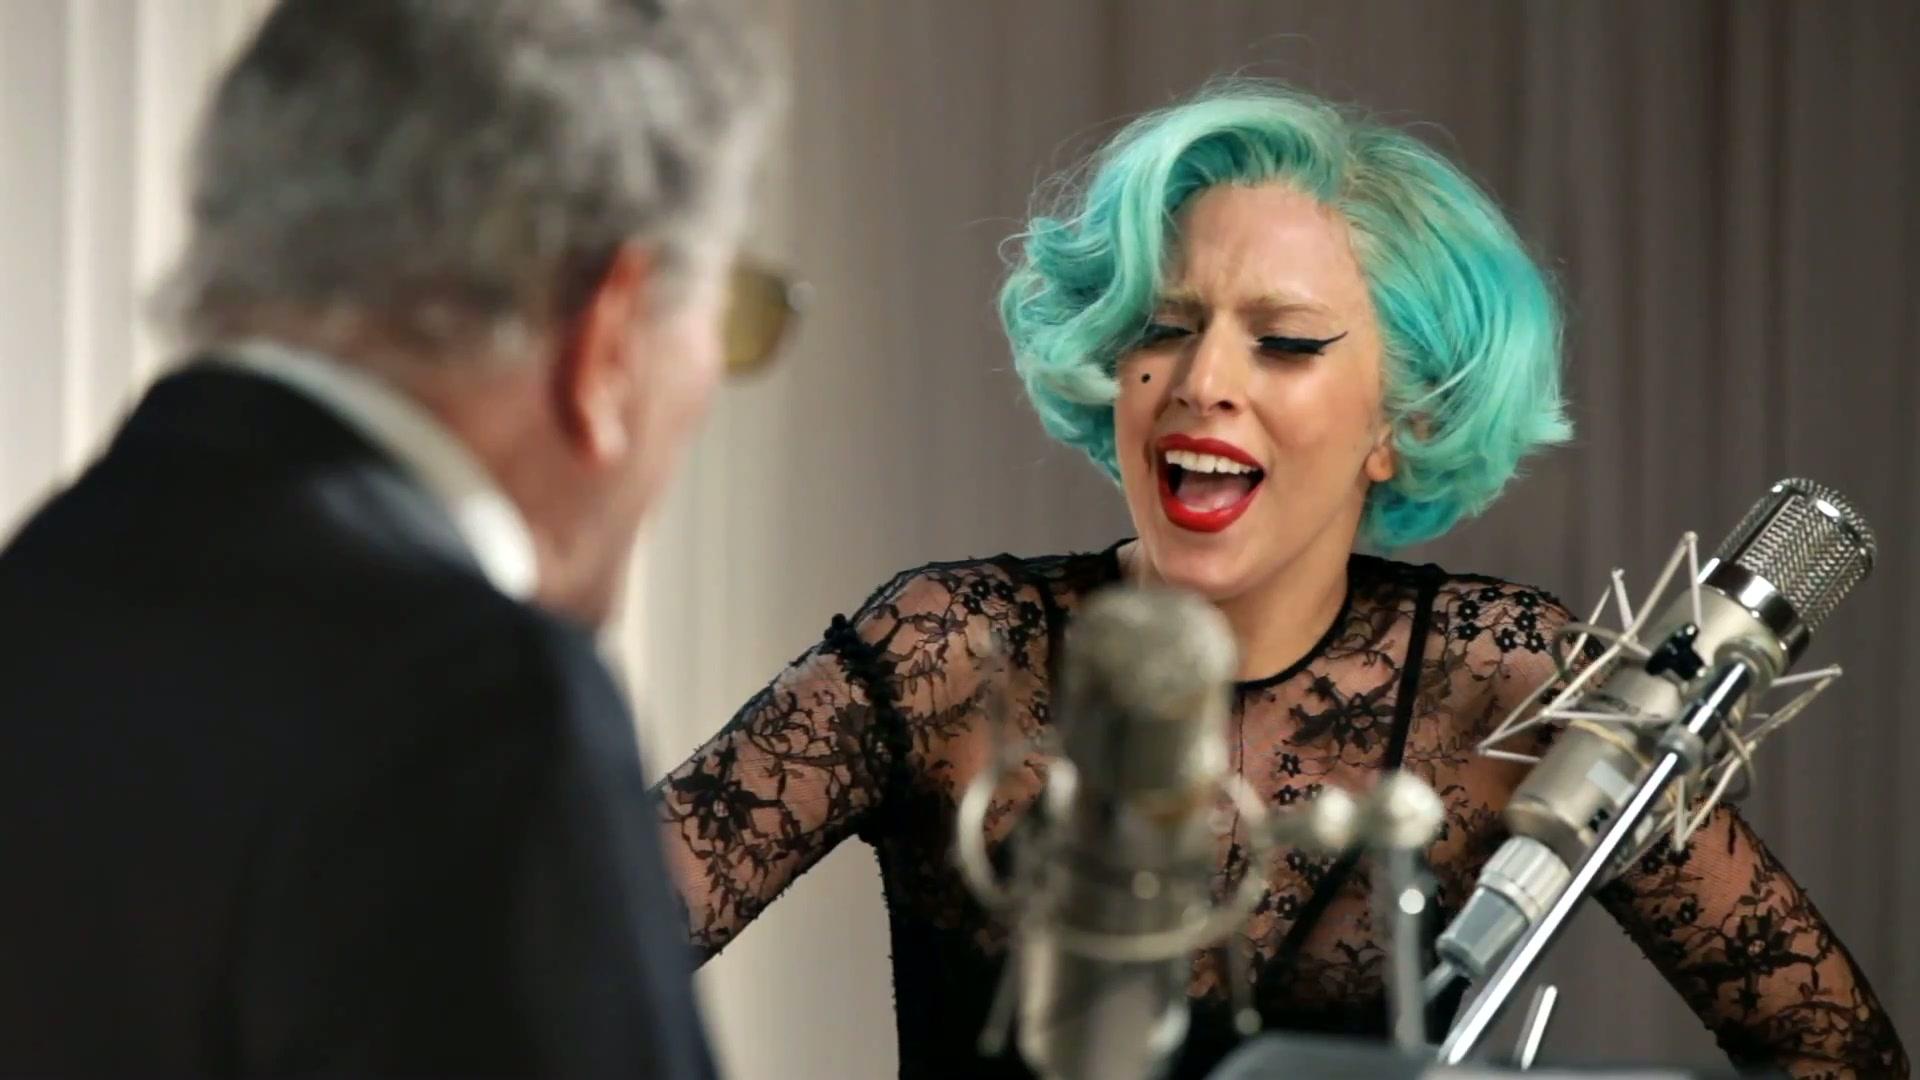 Lady Gaga – Anything Goes (feat. Tony Bennett)